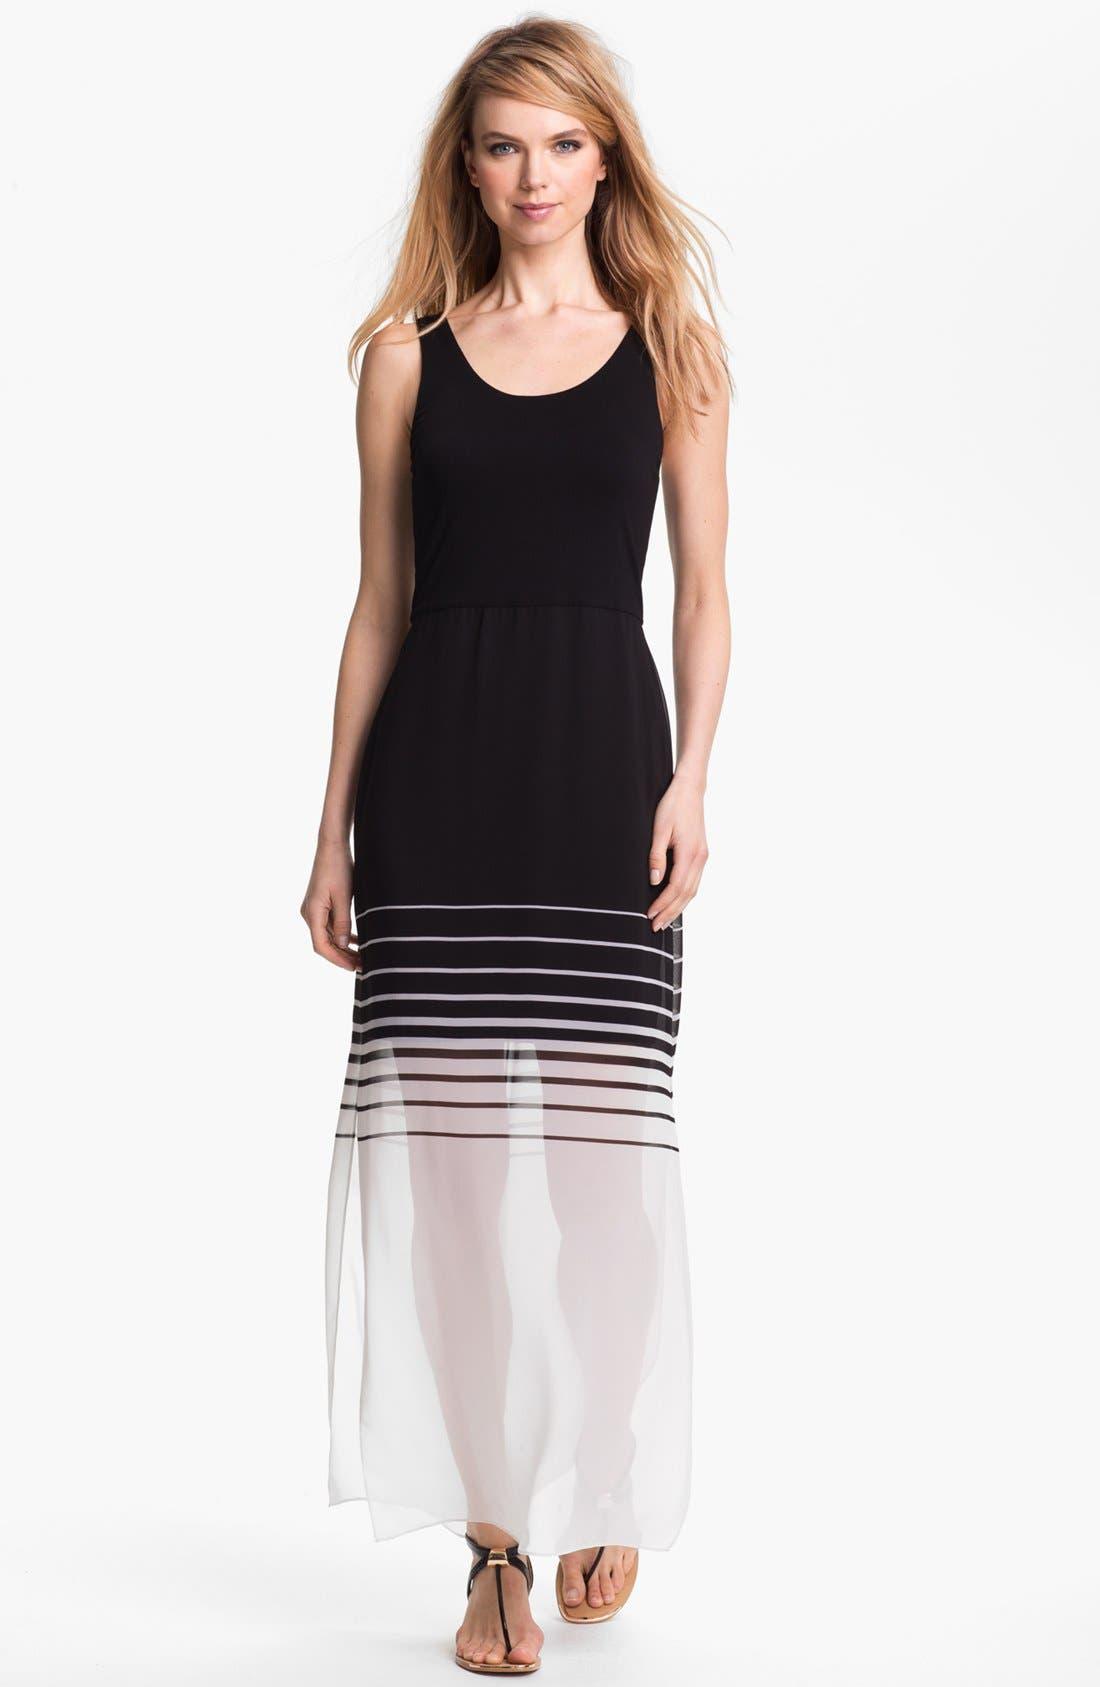 Alternate Image 1 Selected - Vince Camuto Mixed Media Maxi Dress (Regular & Petite)